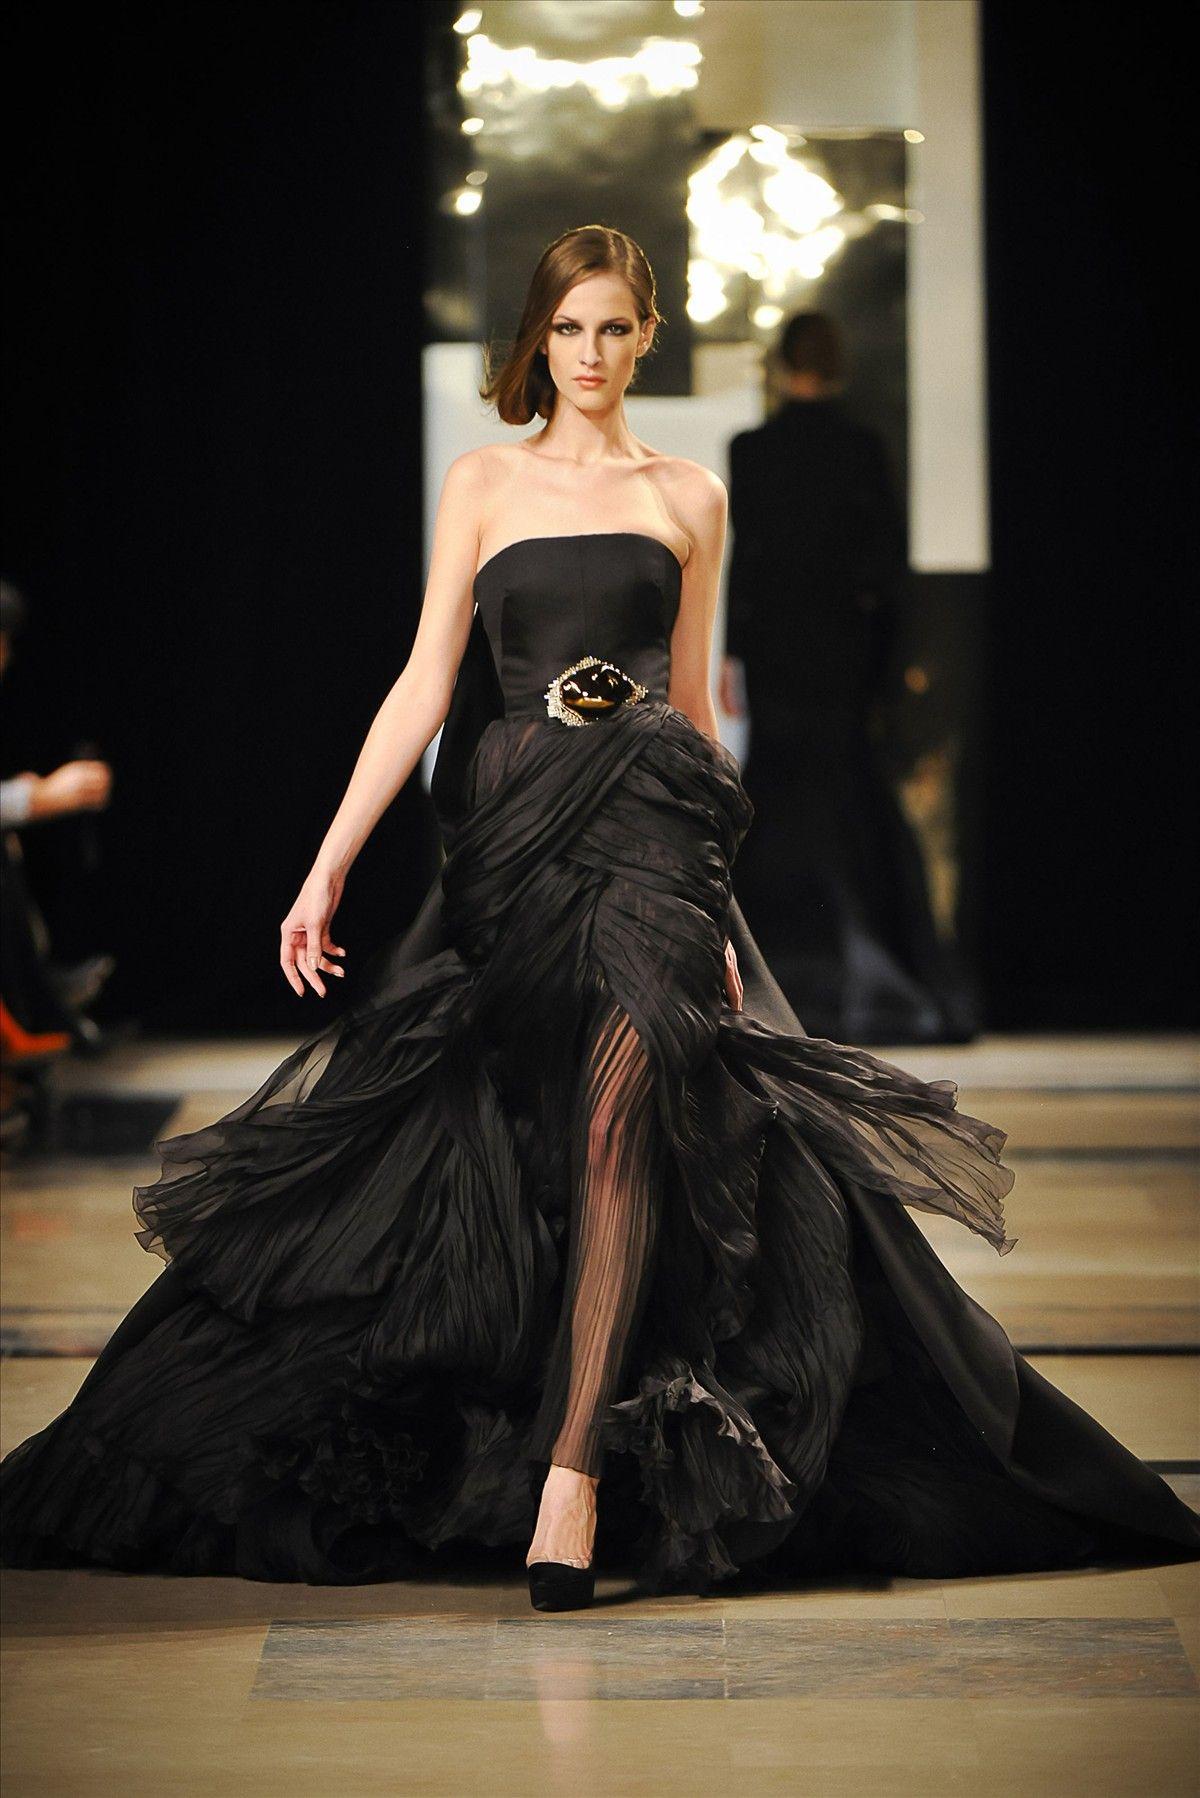 Stunning dress, Yulita (Stéphane Rolland PE 2011 Haute Couture S/S Paris**)